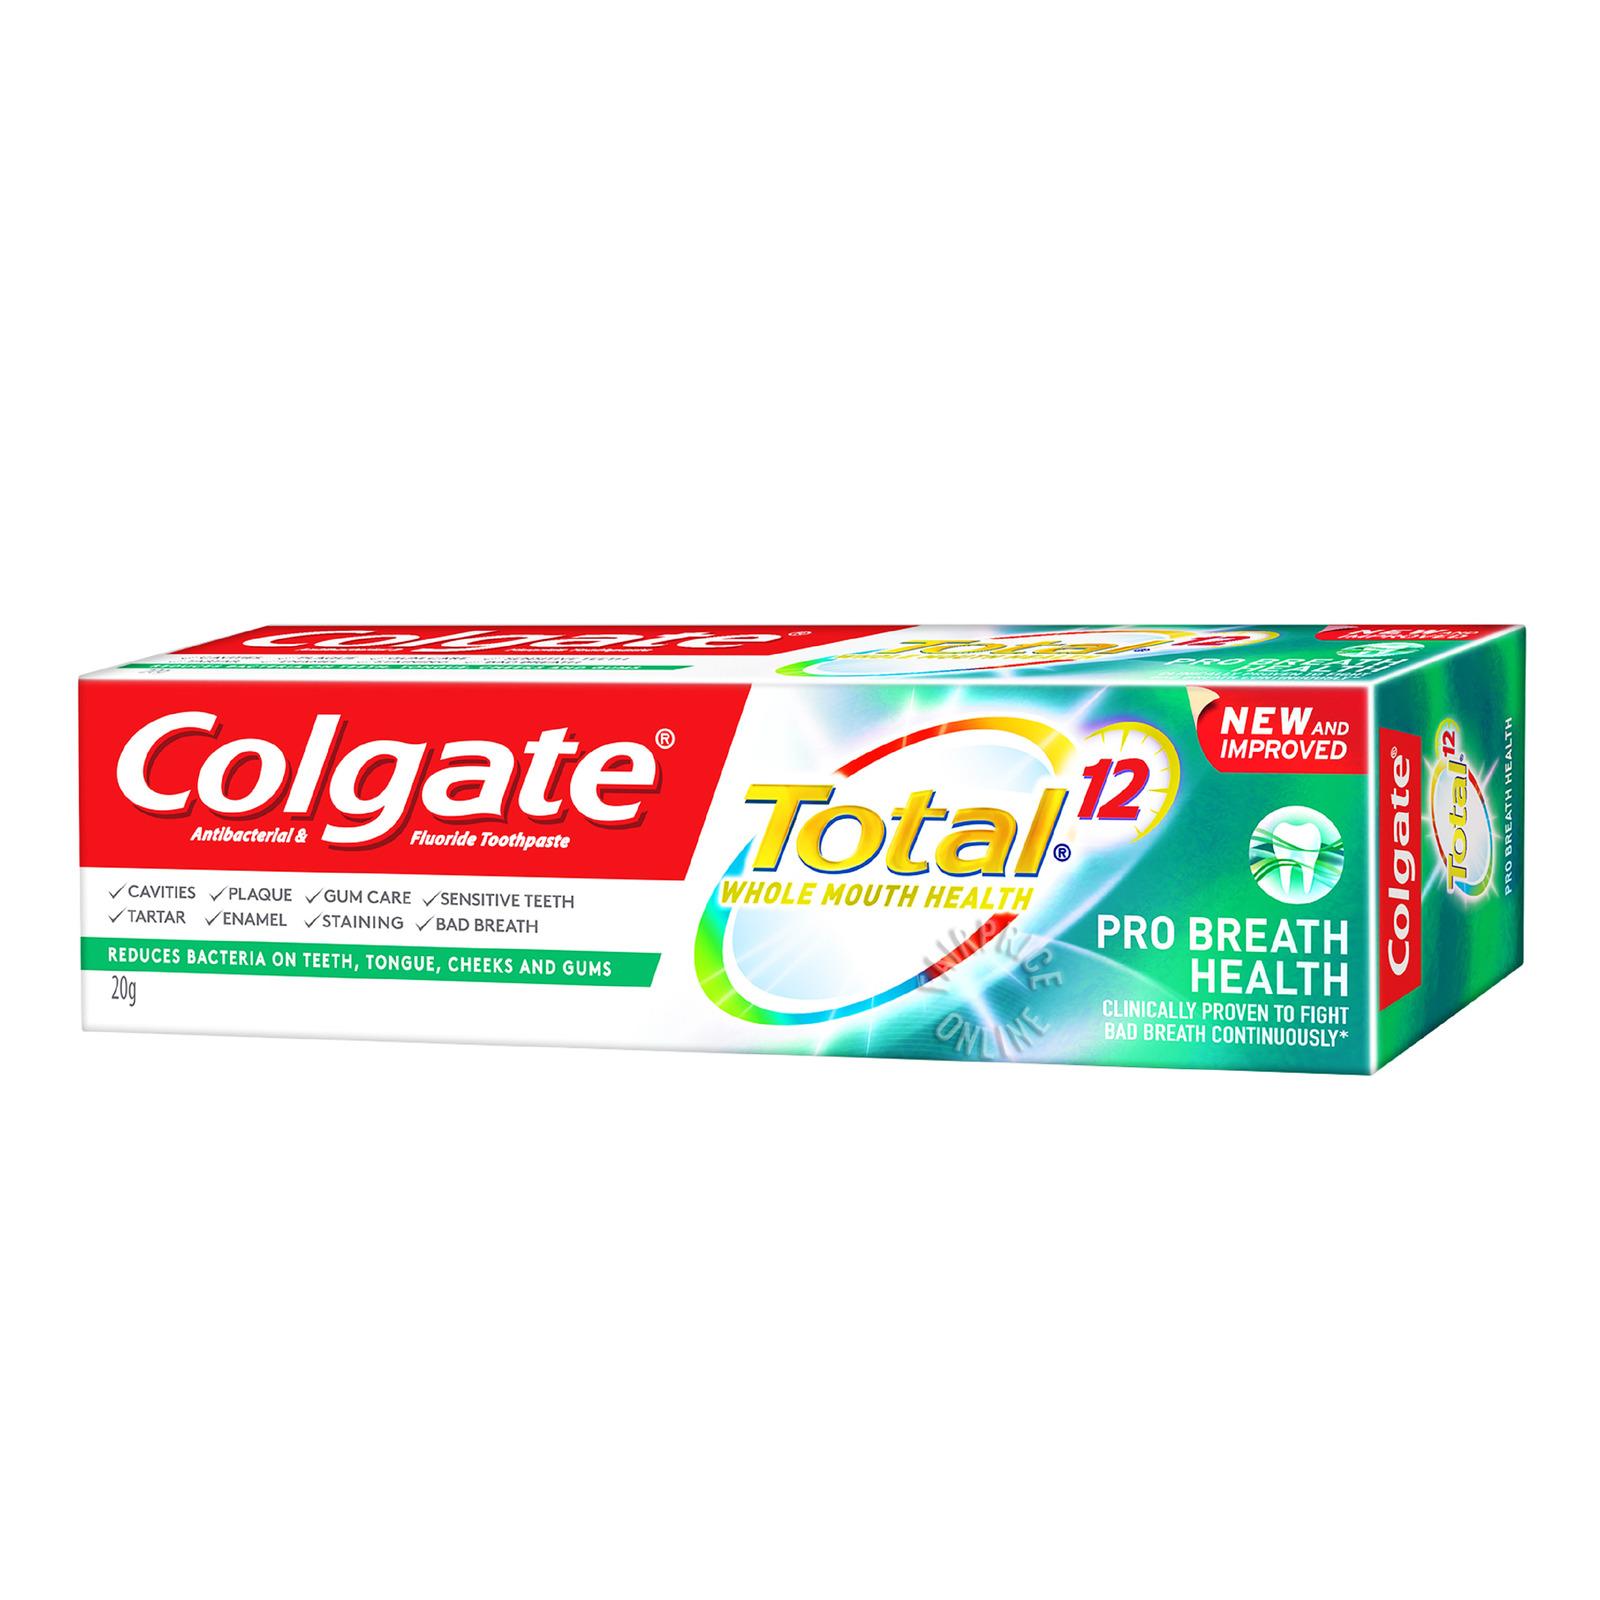 Colgate Total Toothpaste - Pro Breath Health